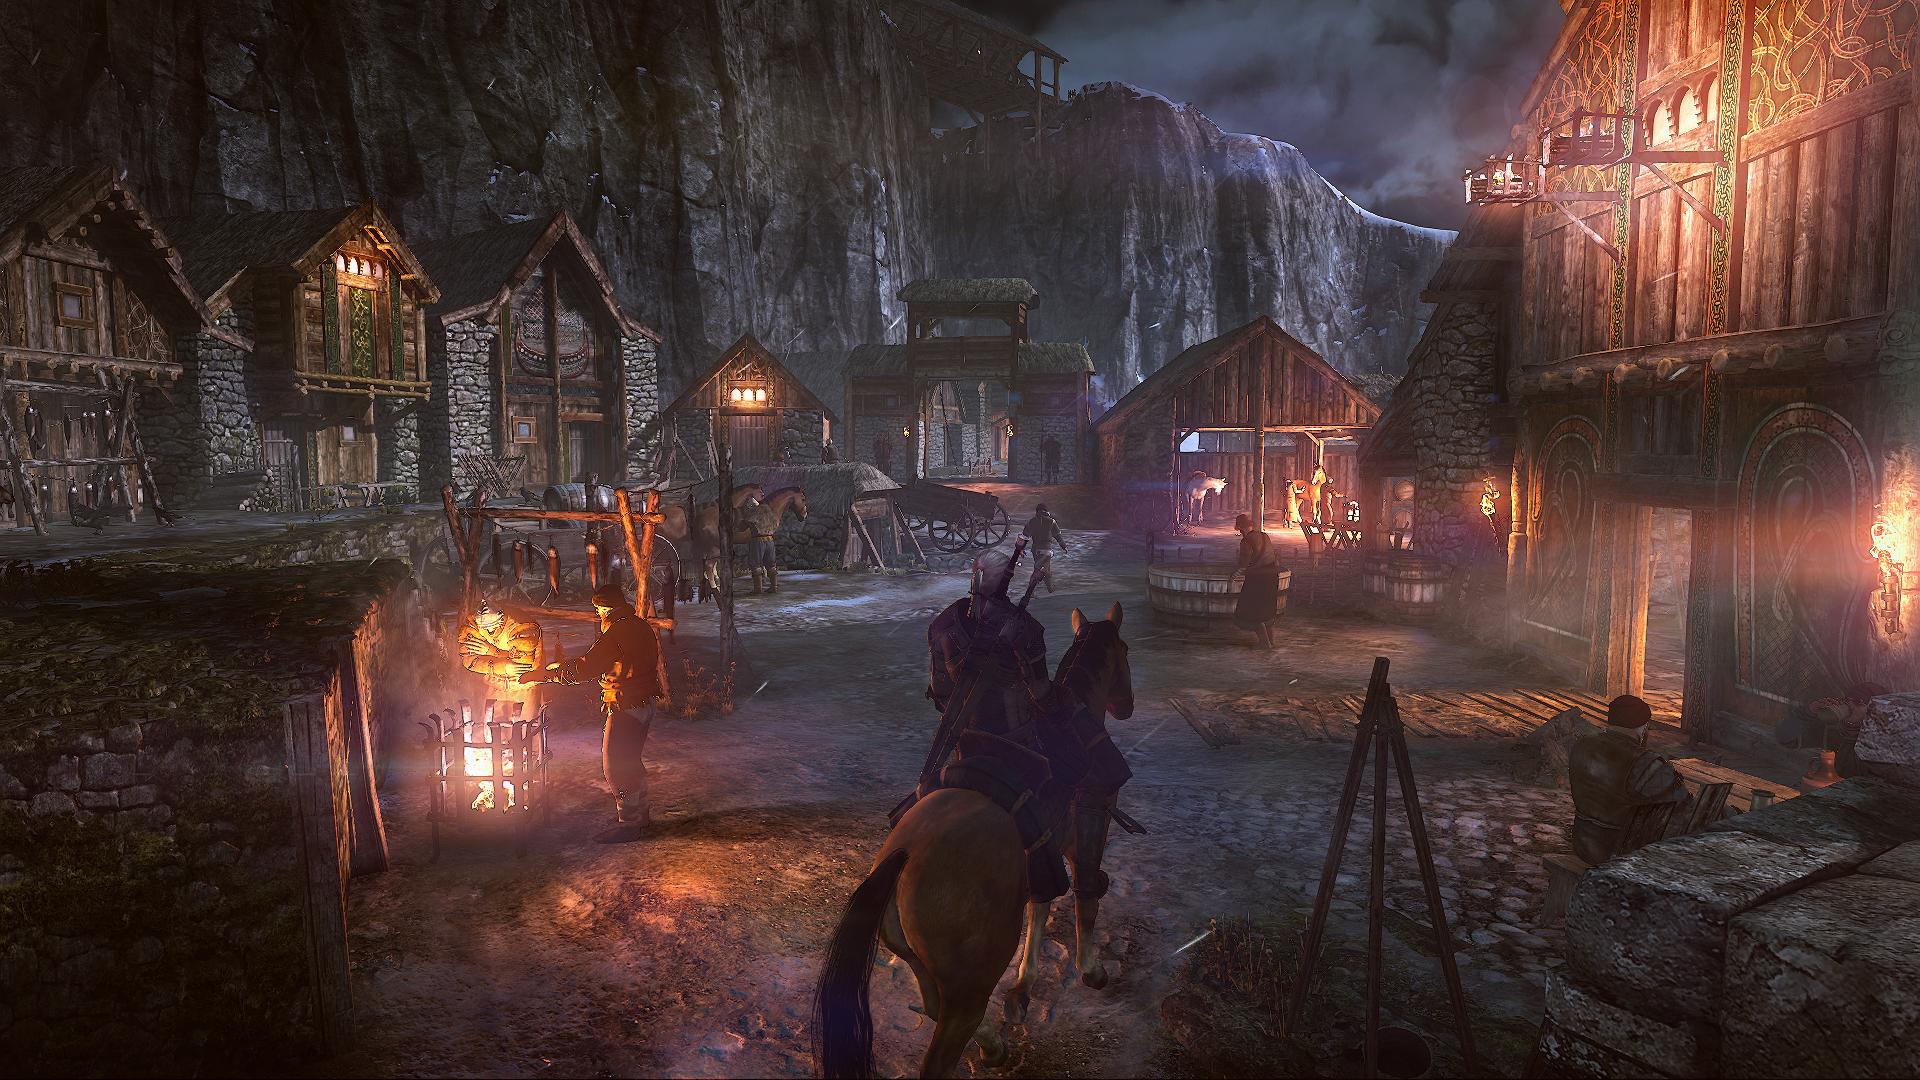 Solo Geralt de Rivia siendo asombroso en este trailer de The Witcher 3: Wild Hunt [Vídeo]